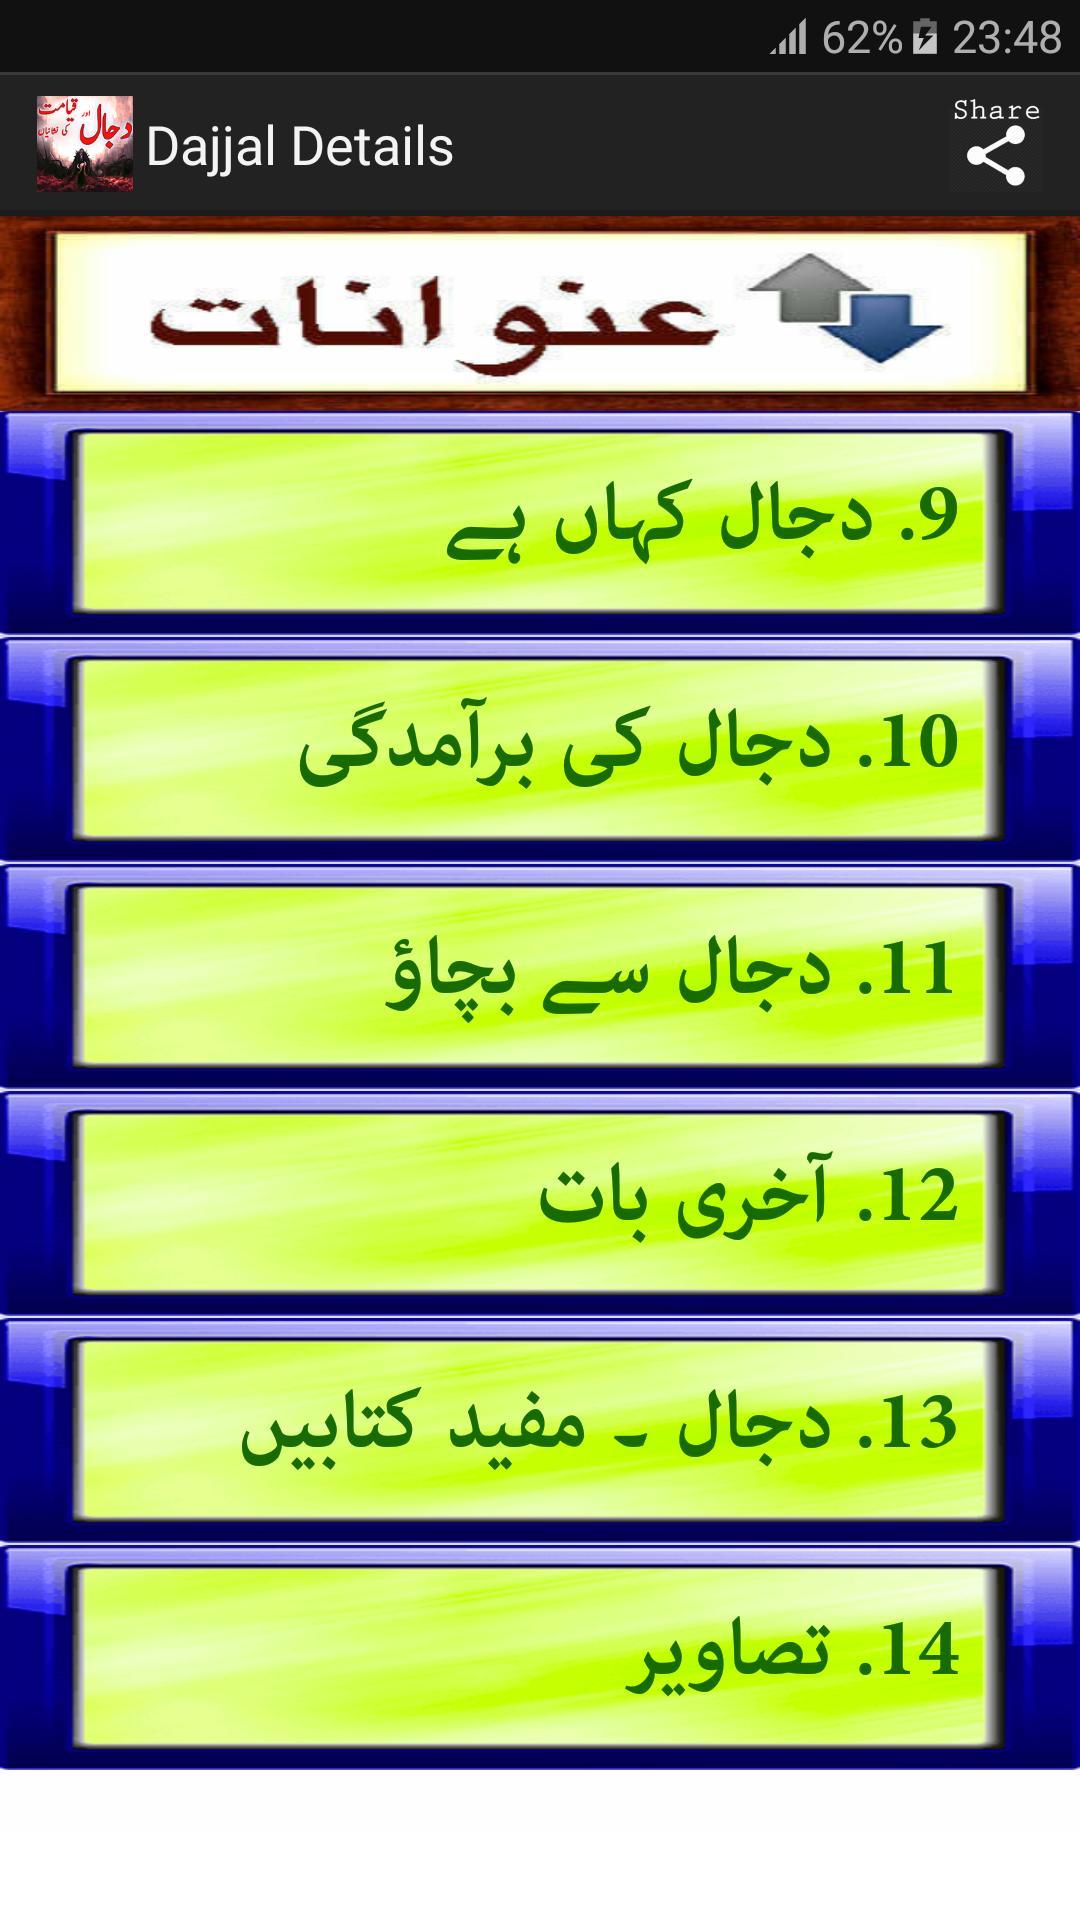 Dajjal Aur Qayamat Urdu for Android - APK Download